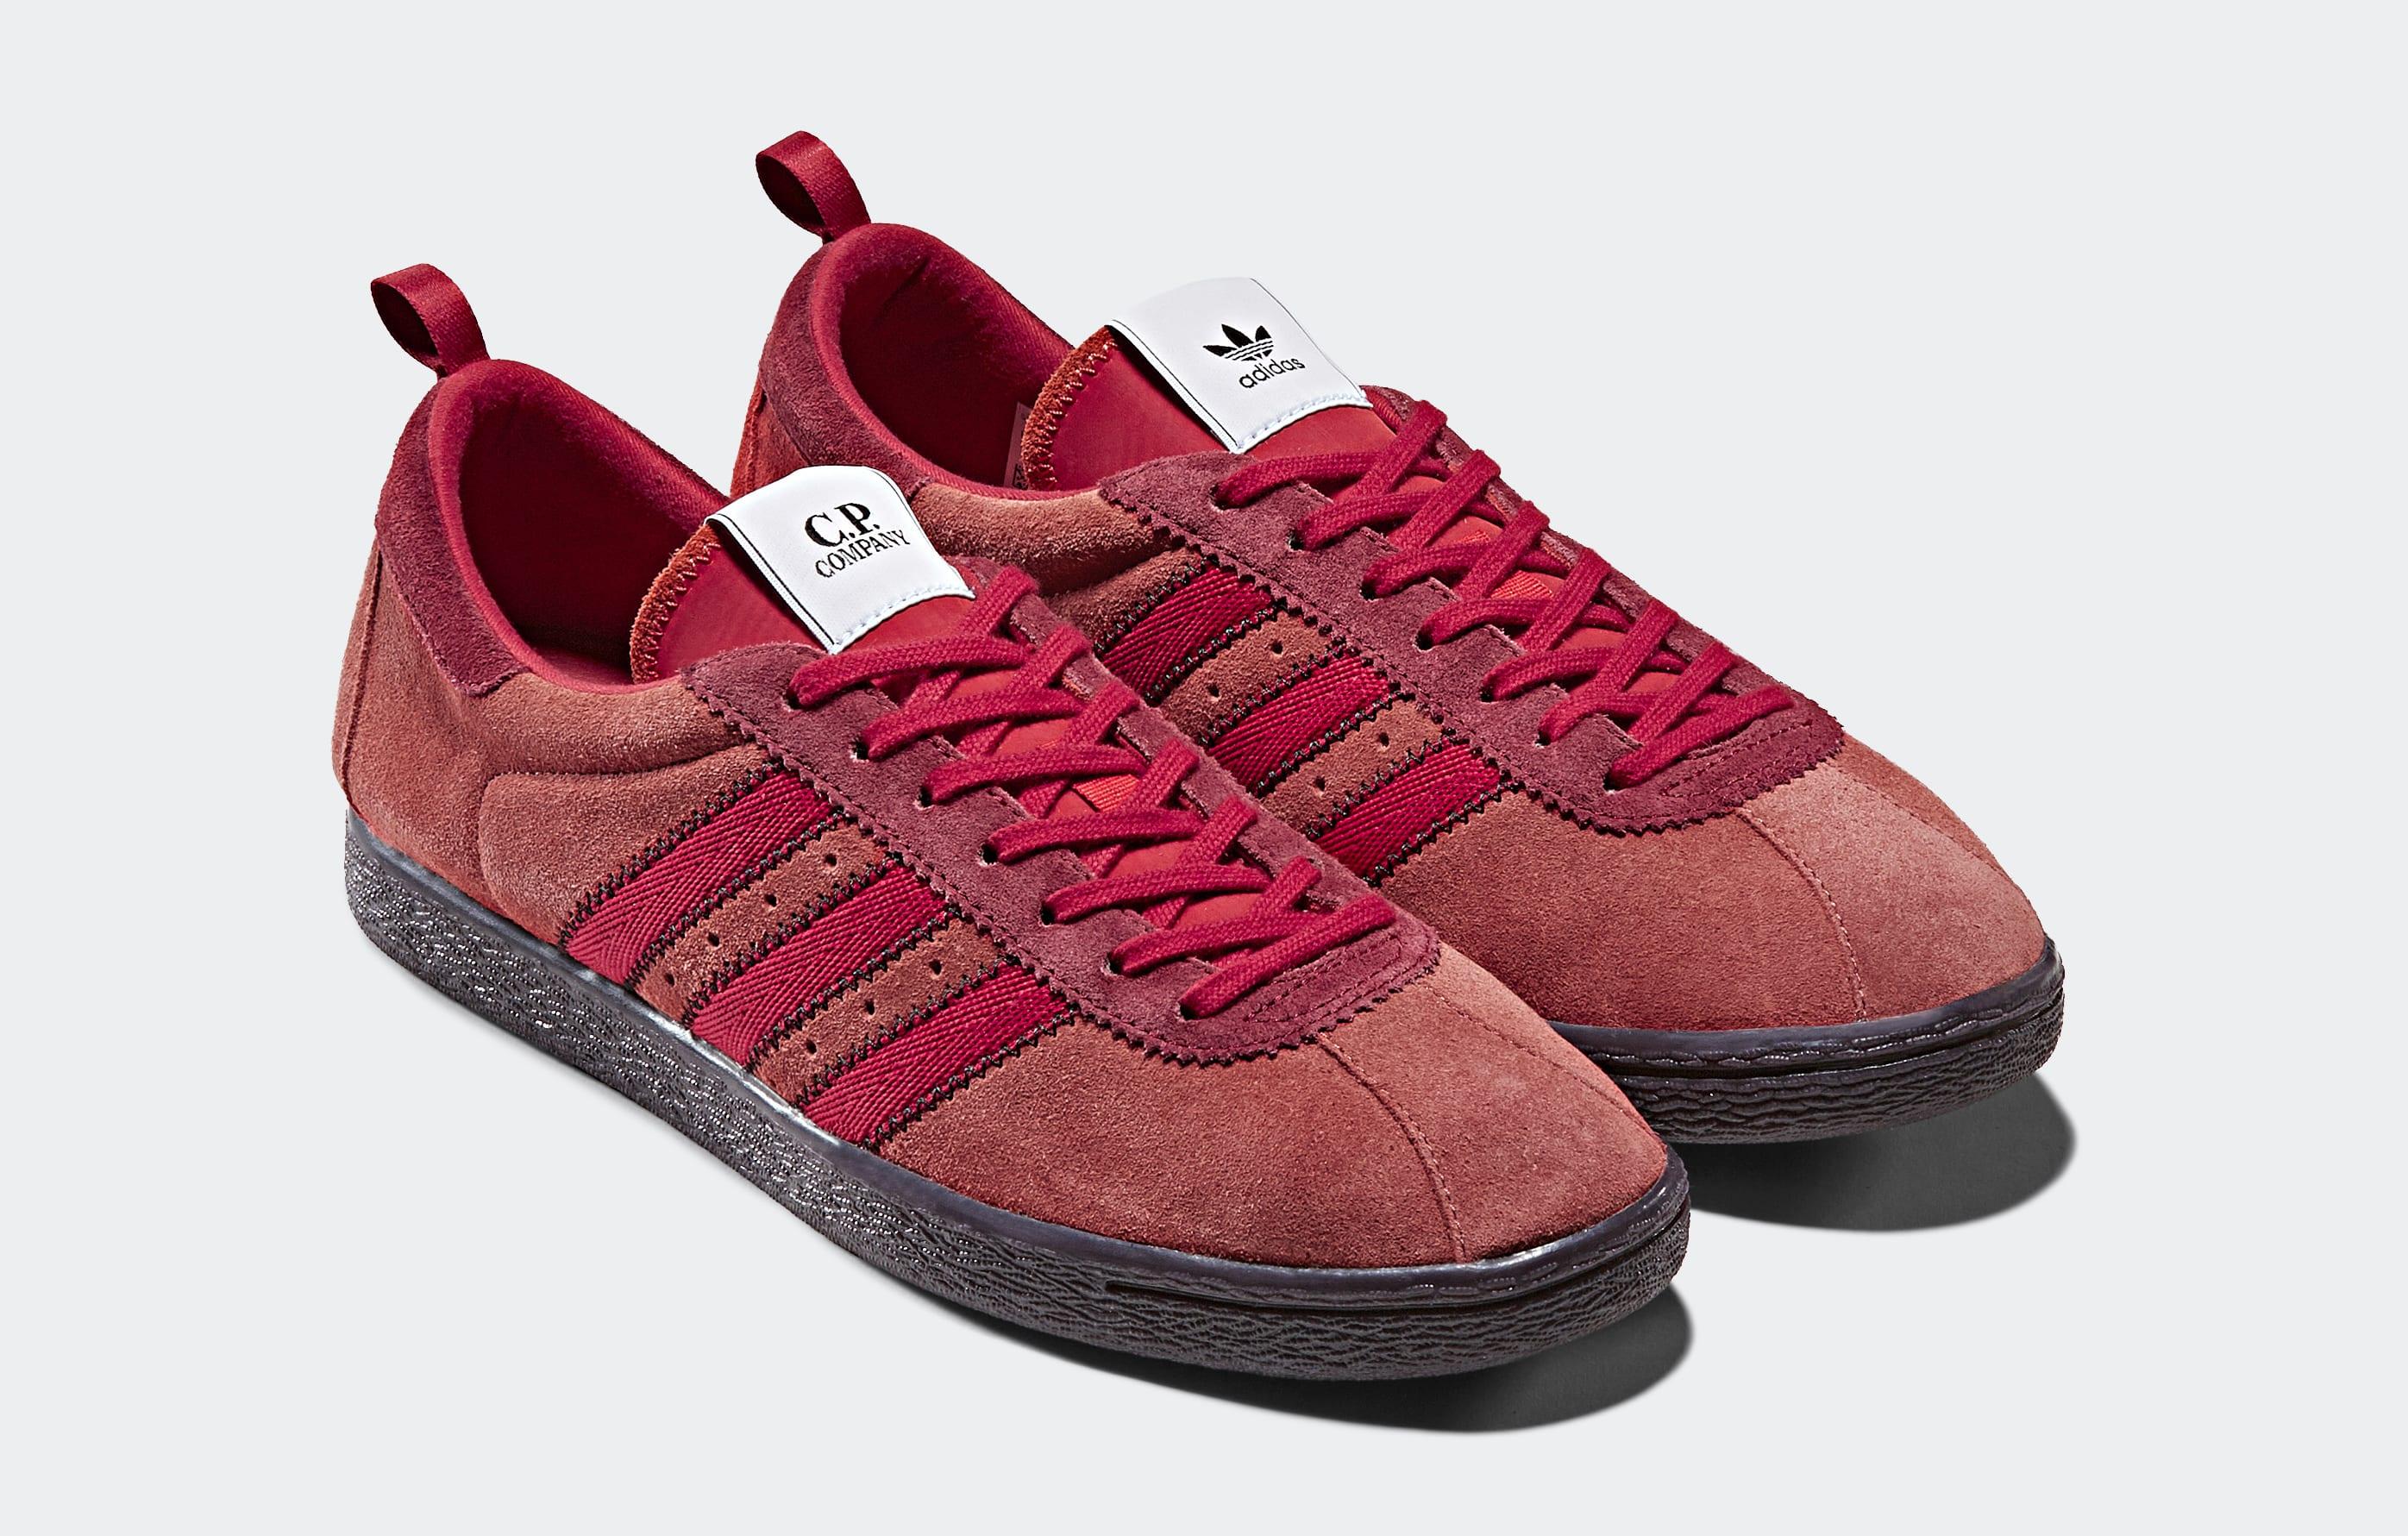 Adidas x C.P. Company Samba 'Red' BD7959